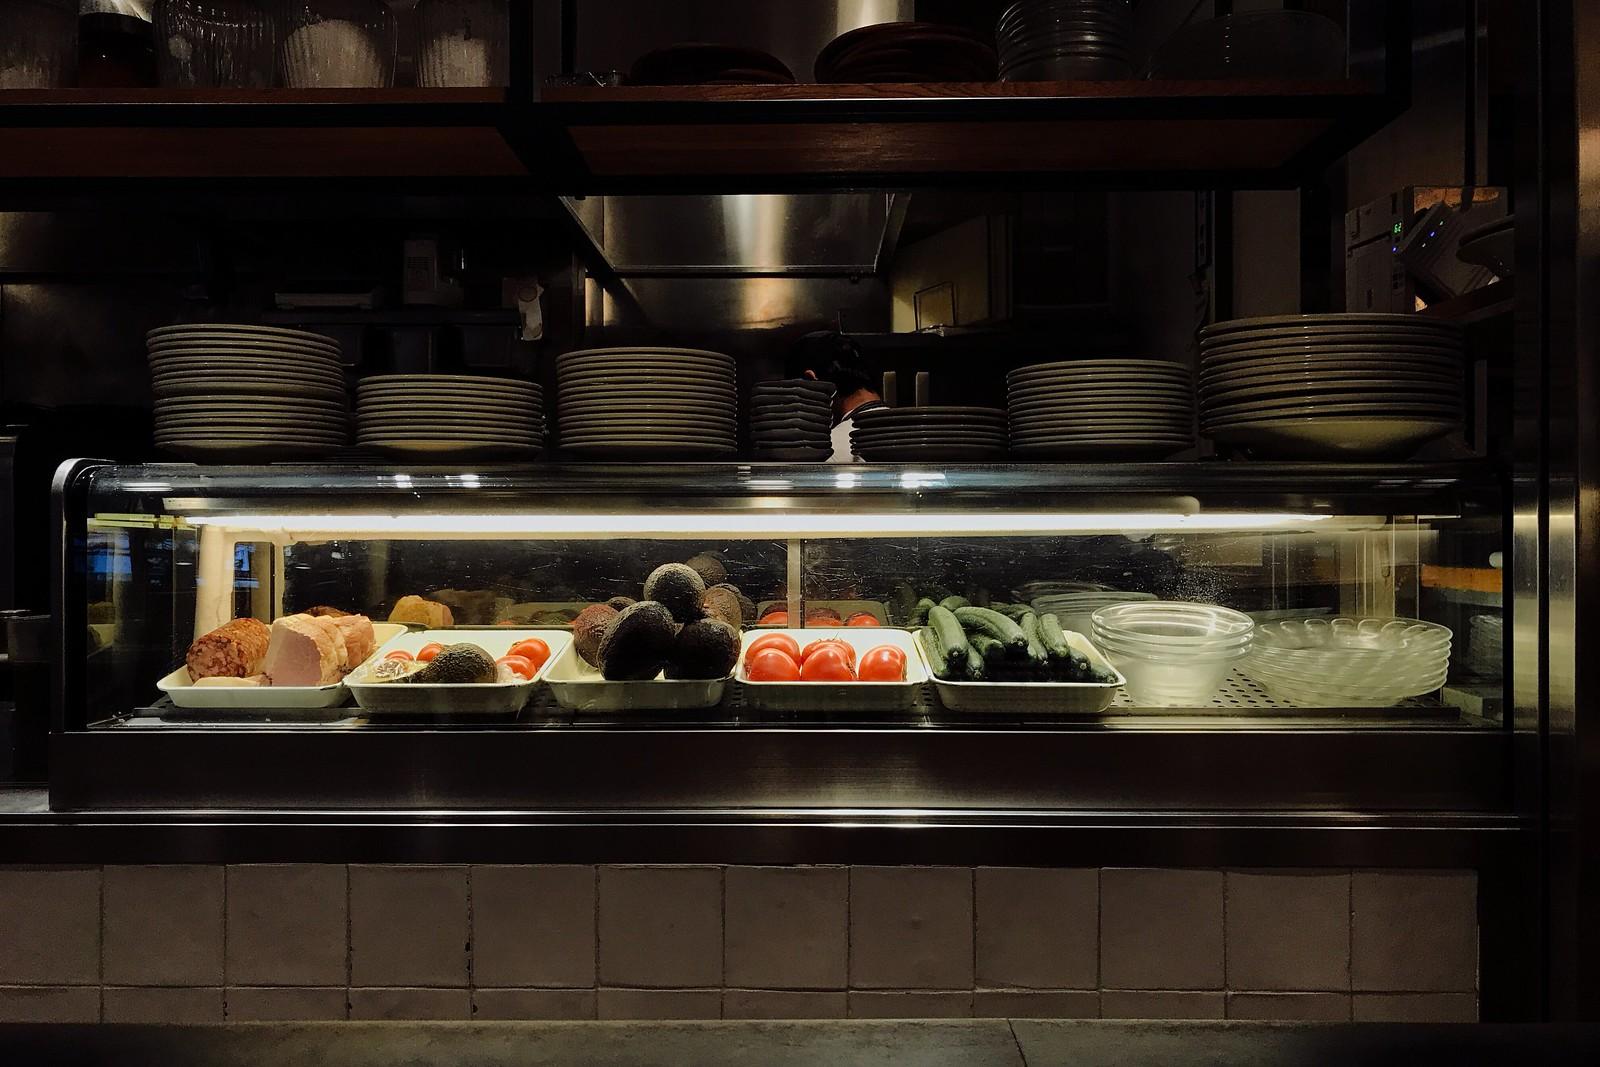 Restaurant kitchen #ShotoniPhone #ShotWithHalide  #RNIFilms #KodakEliteChrome #iPhone7